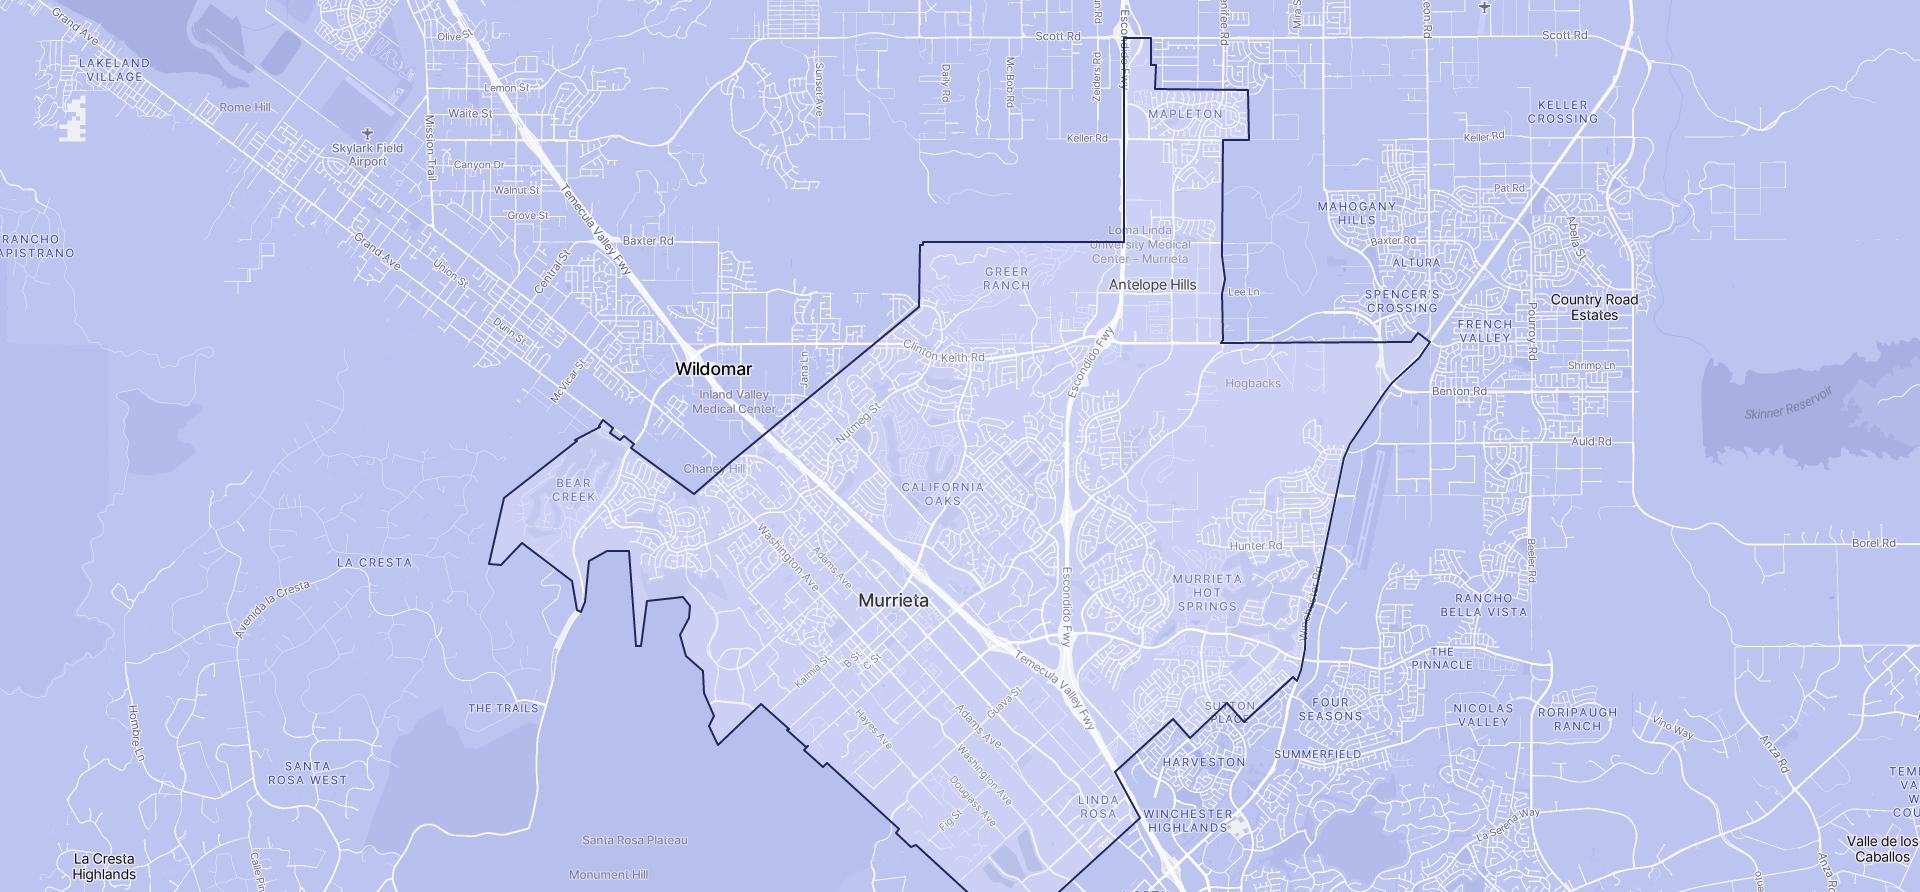 Image of Murrieta boundaries on a map.